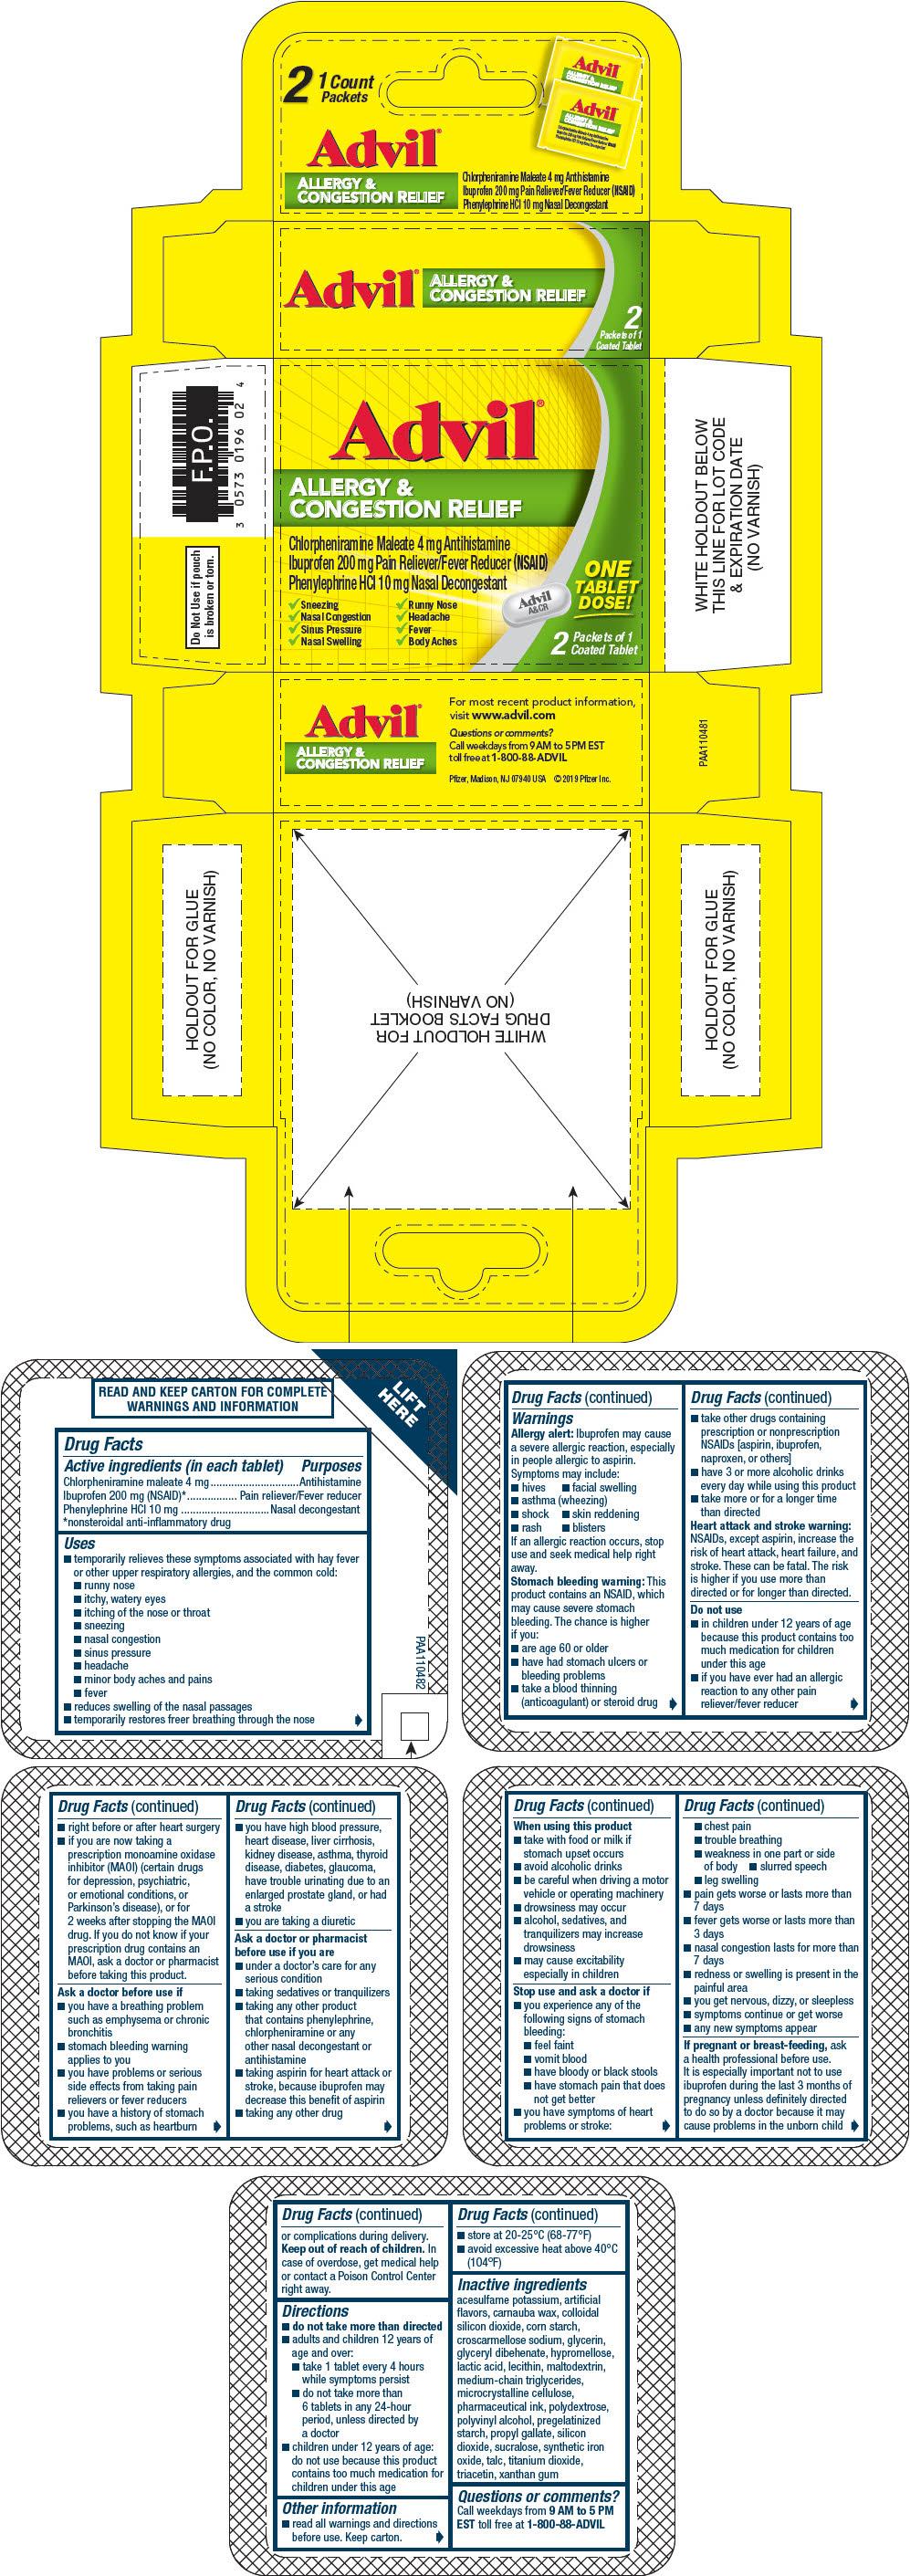 PRINCIPAL DISPLAY PANEL - 2 Tablet Packet Carton